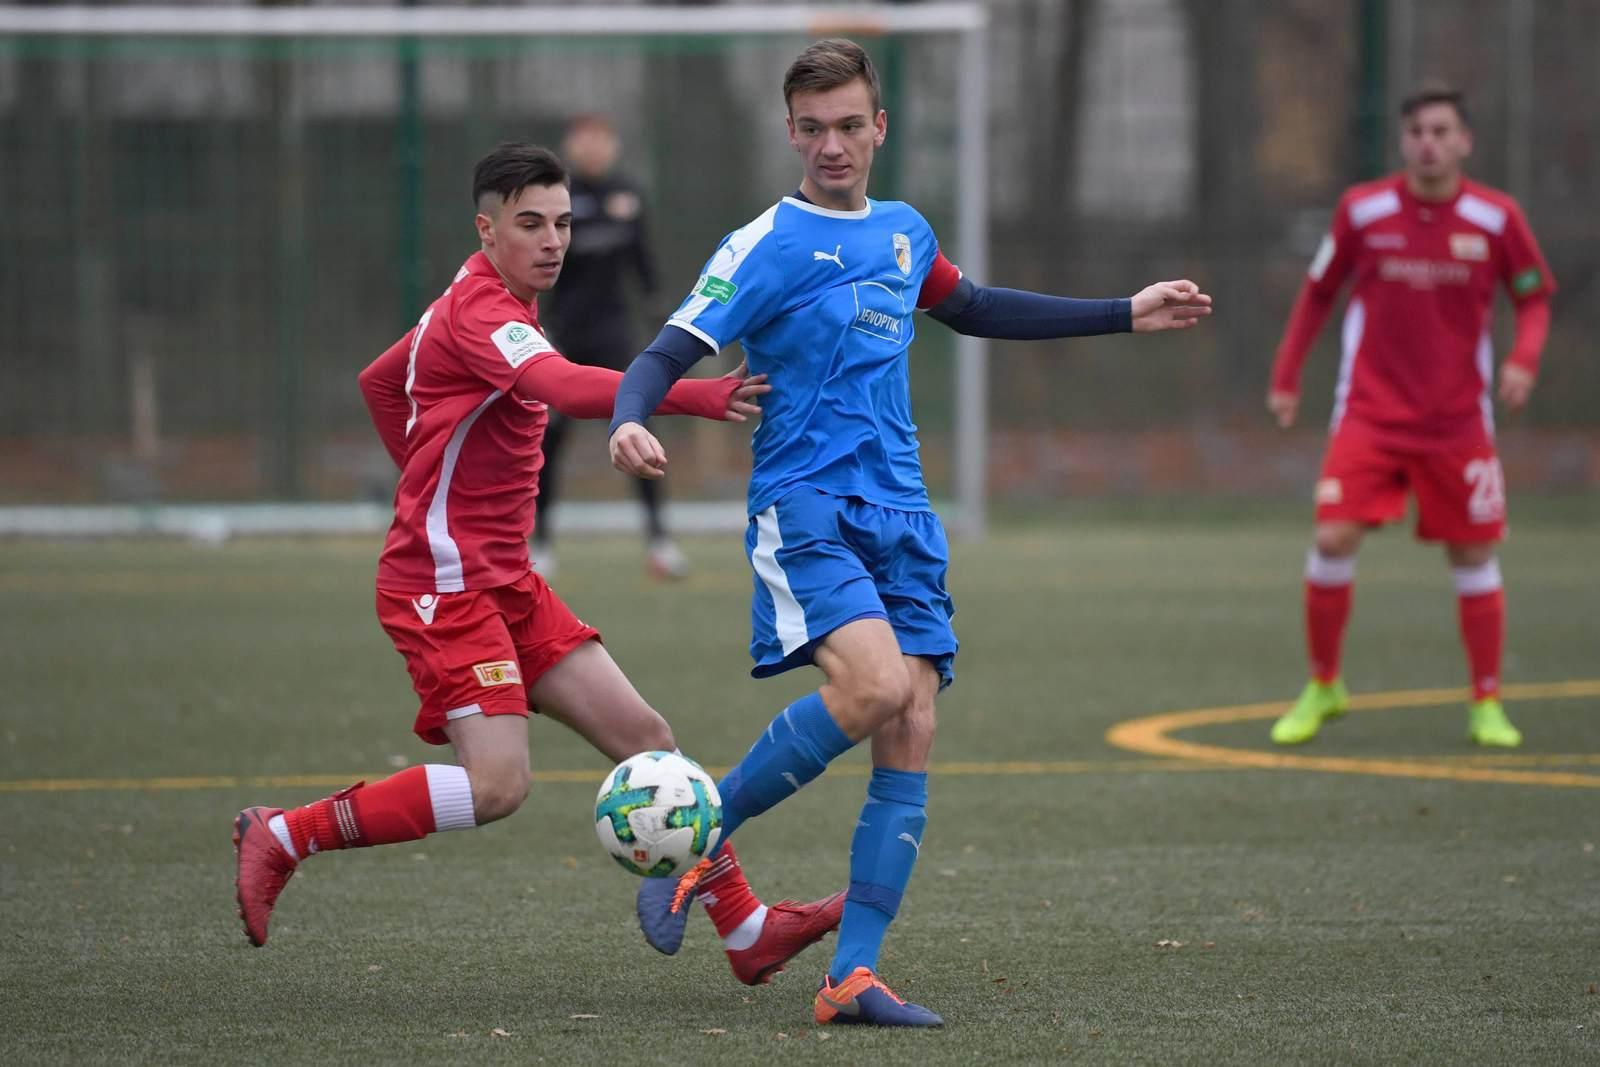 Max Gottwald am Ball für die A-Jugend des FC Carl Zeiss Jena